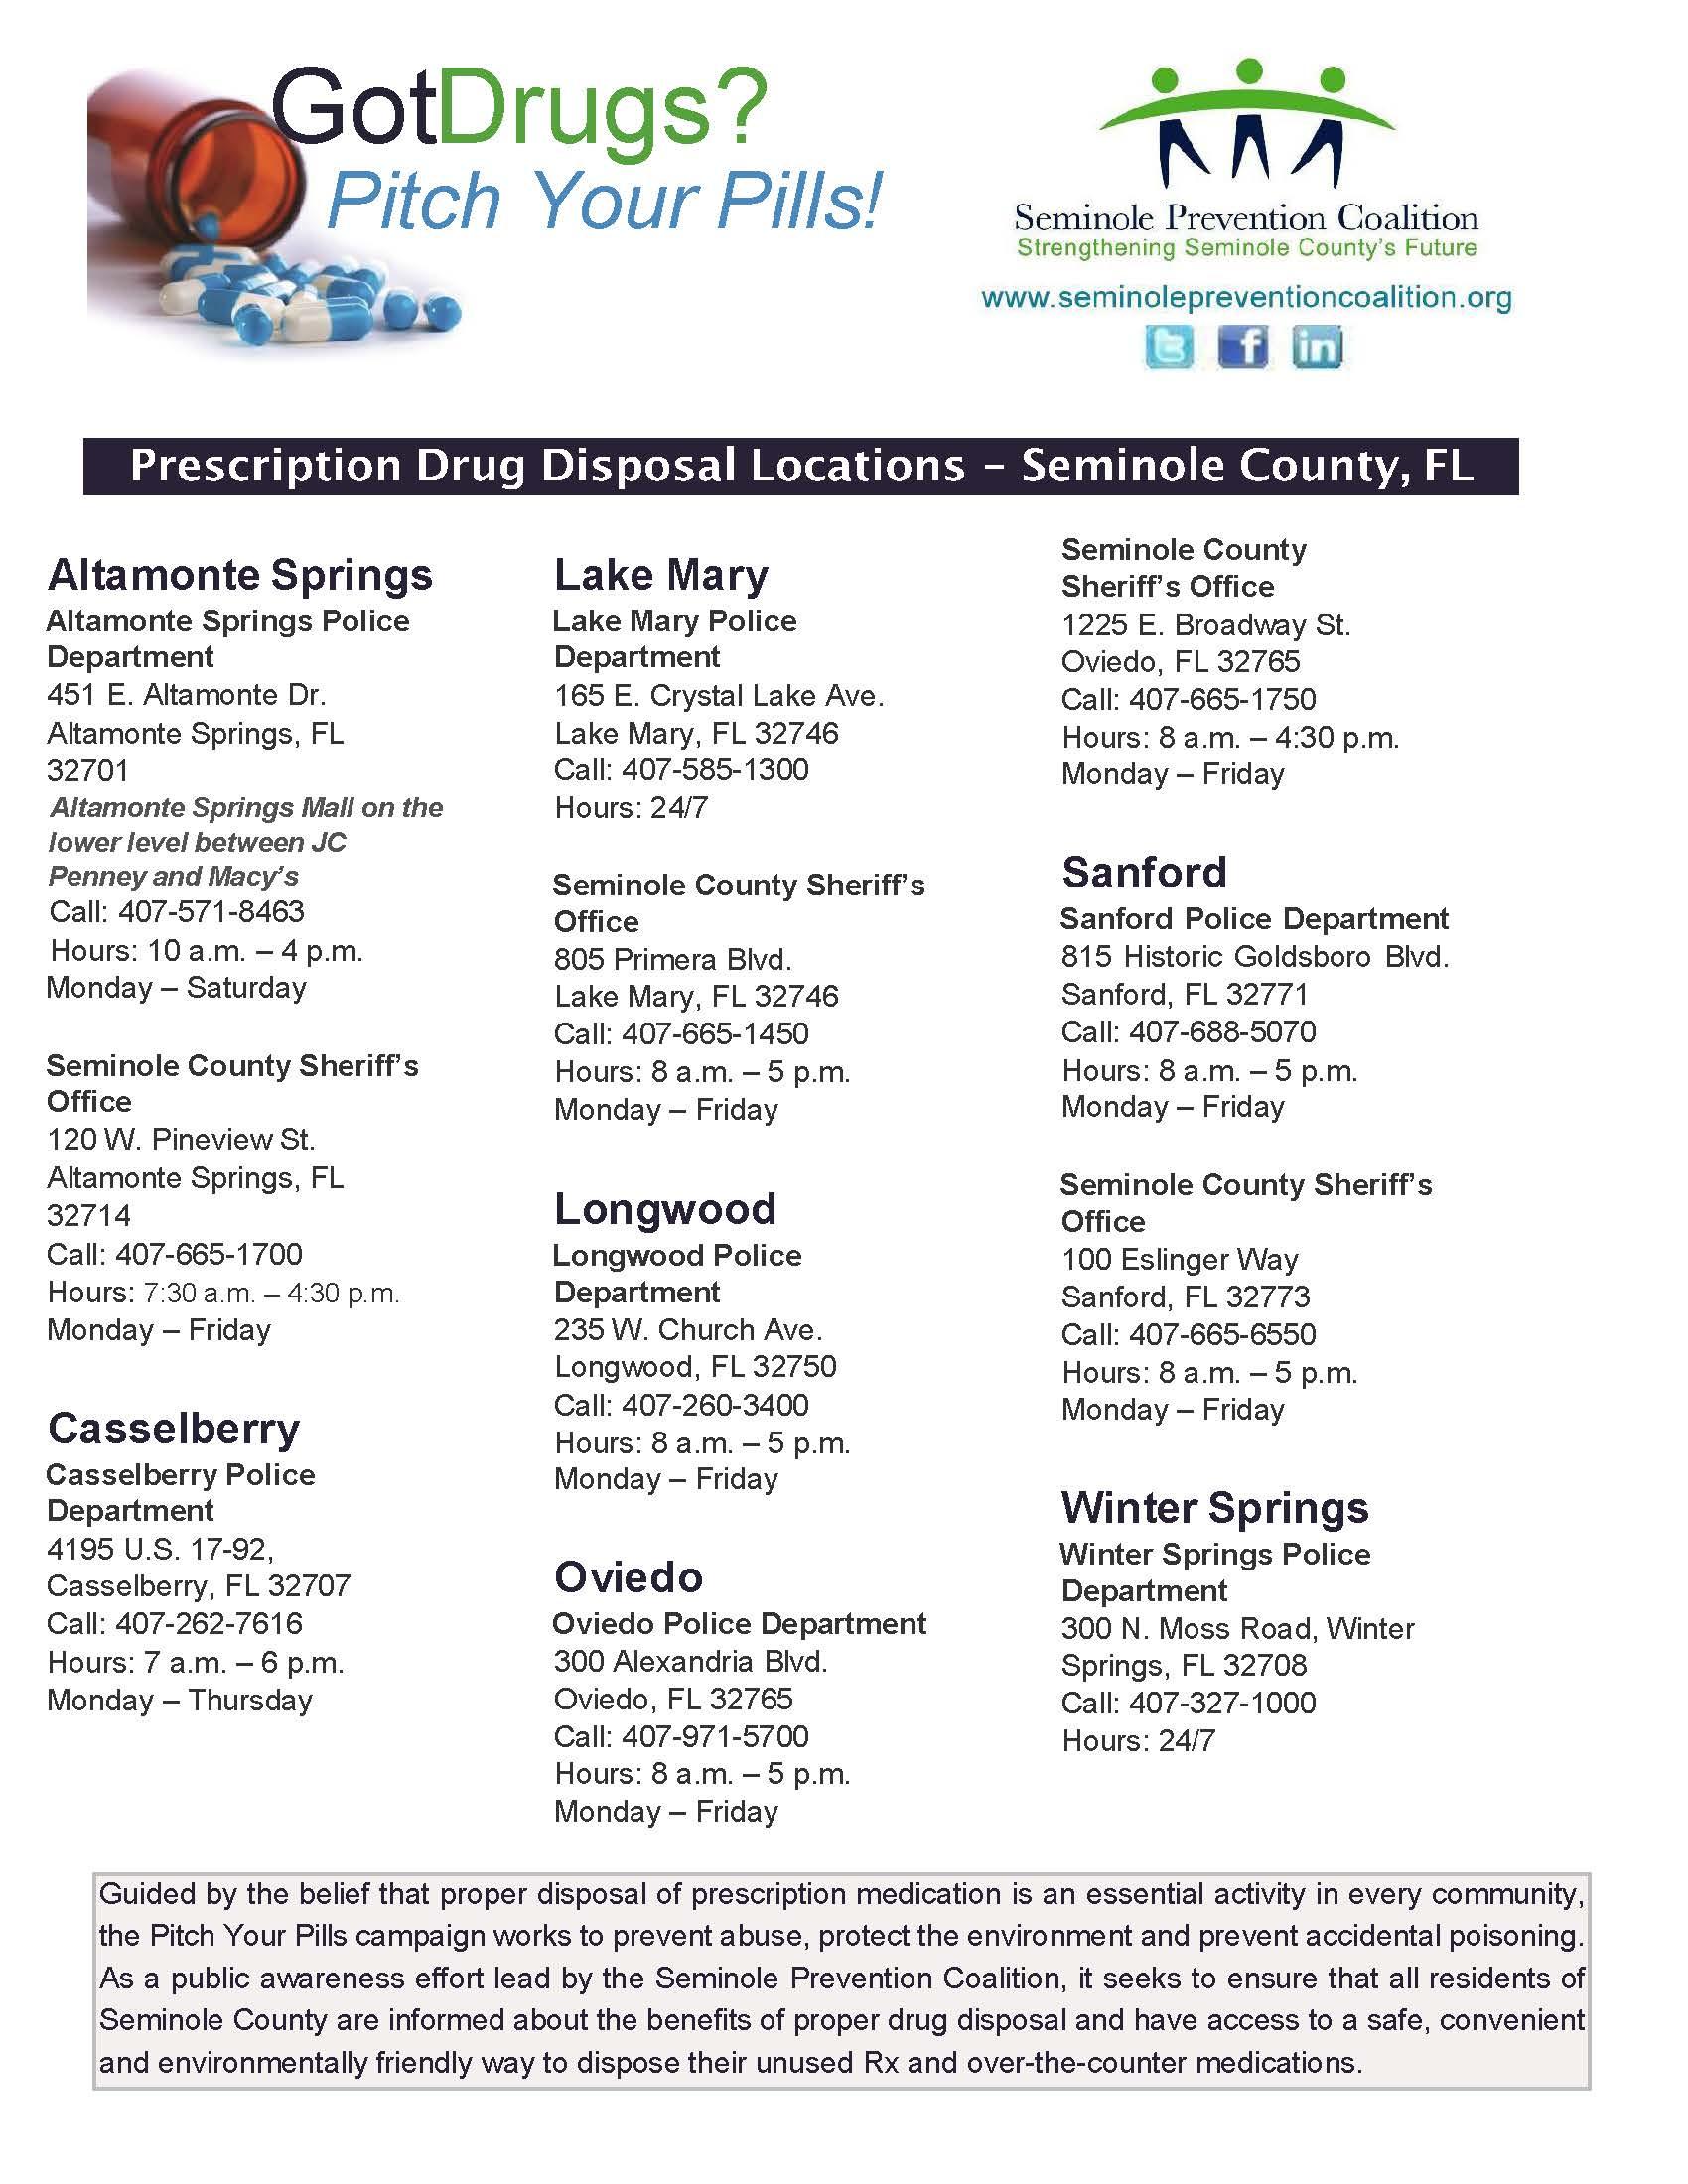 OC Drug Disposal Locations